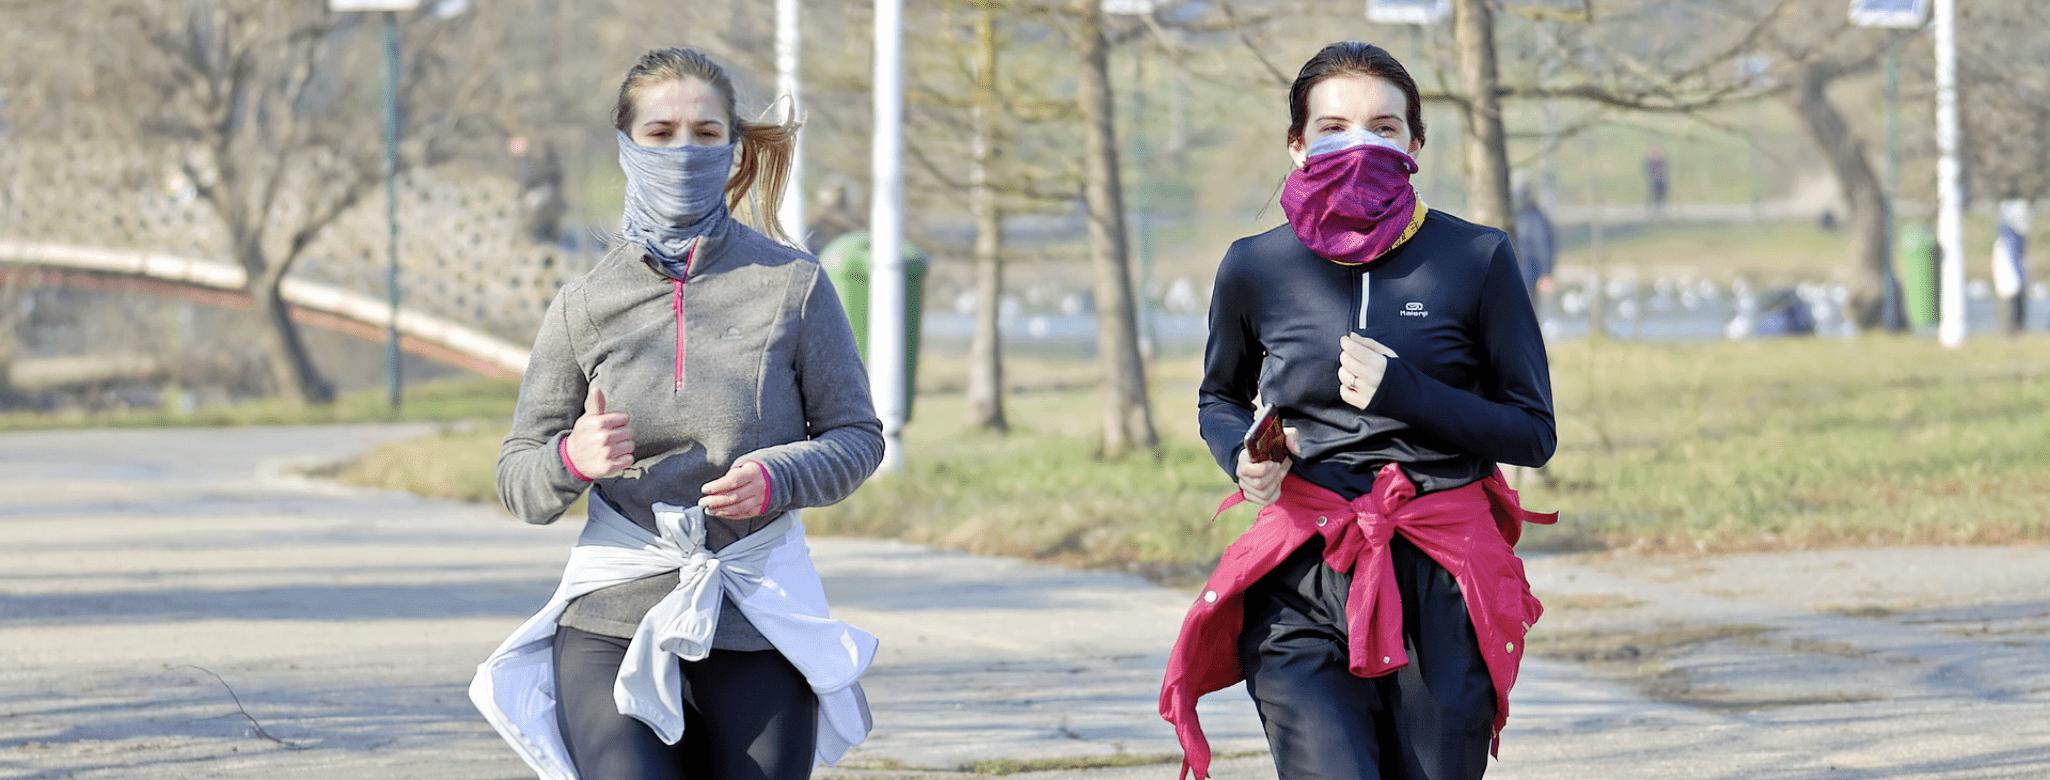 Il running ai tempi del Coronavirus